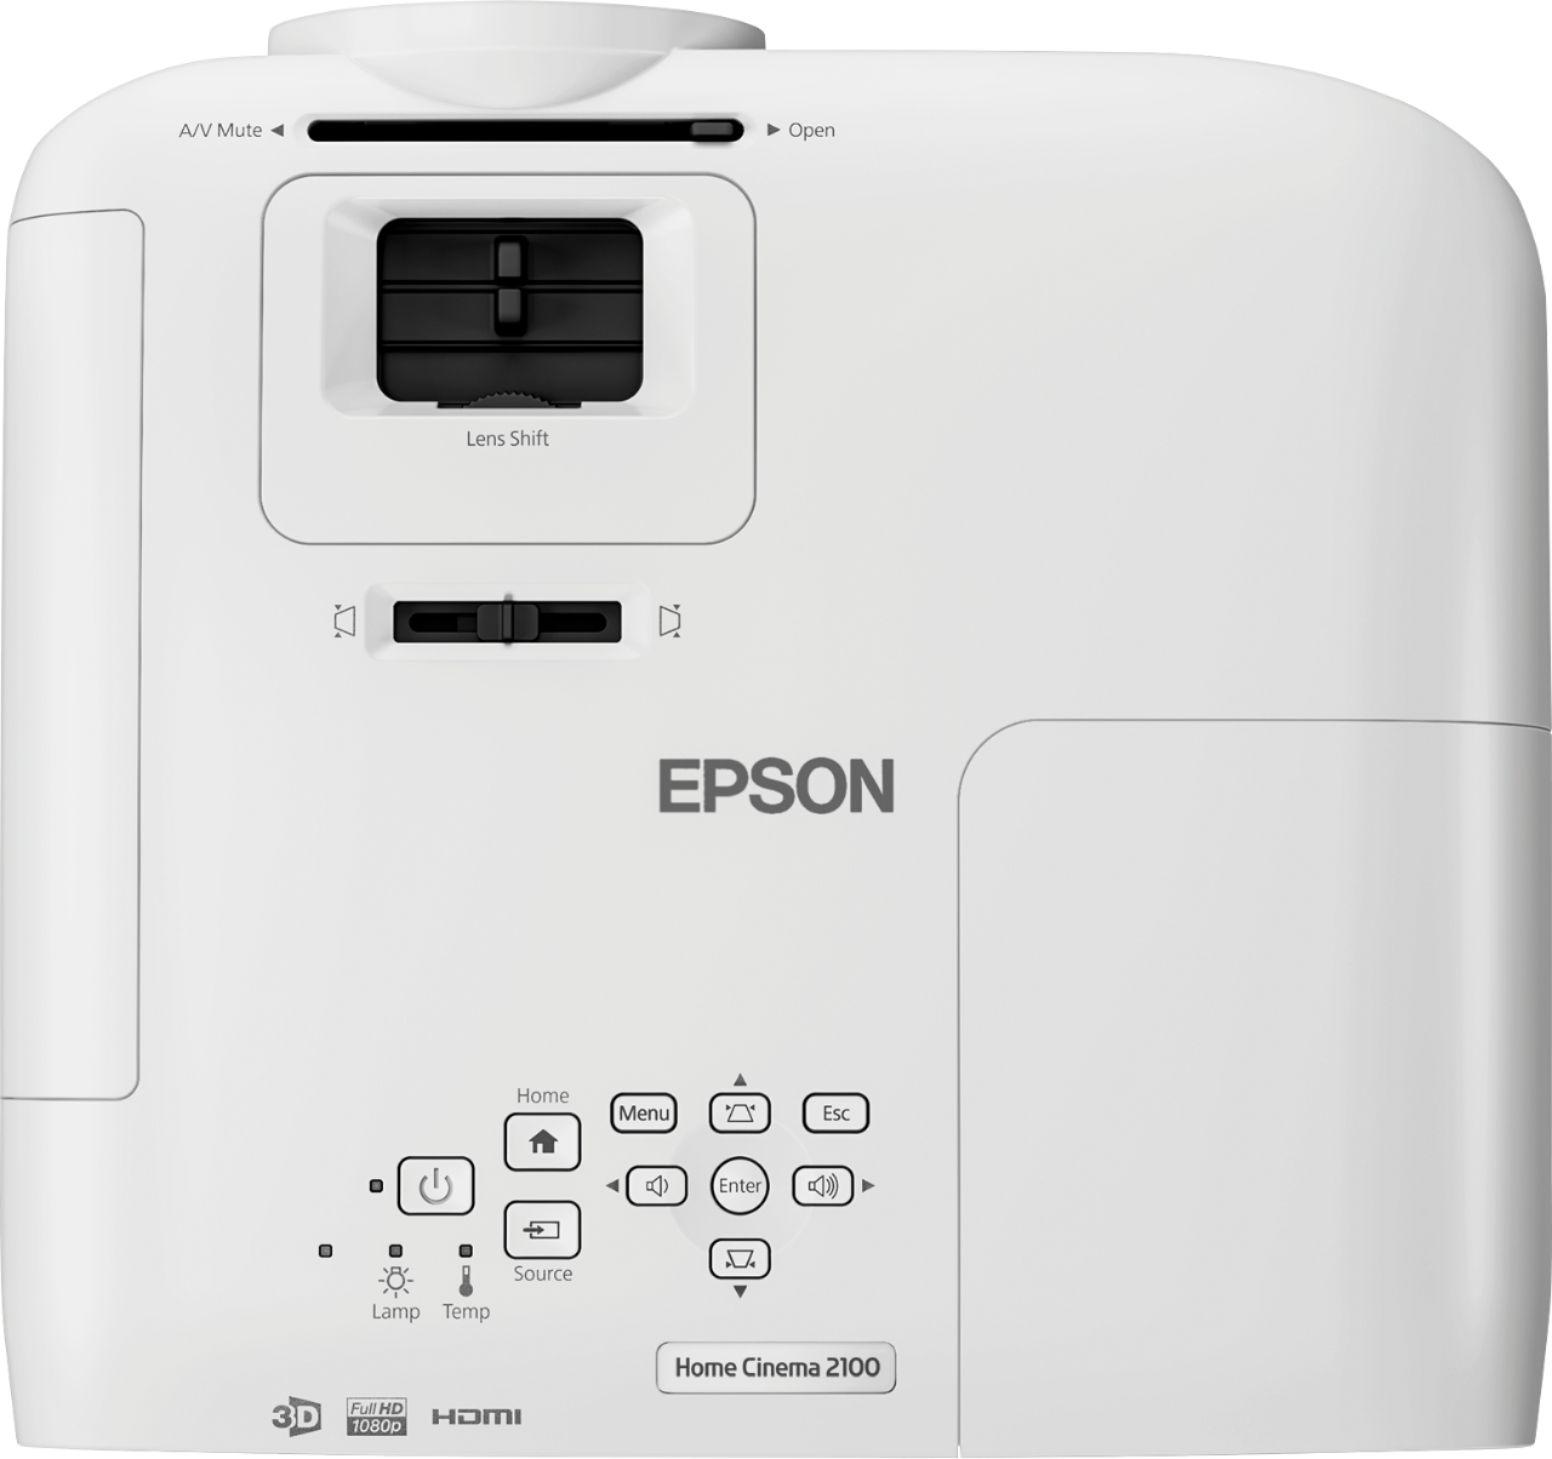 Epson EPSON HOME CINEMA 2100 V11H851 1080p 3LCD Projector White